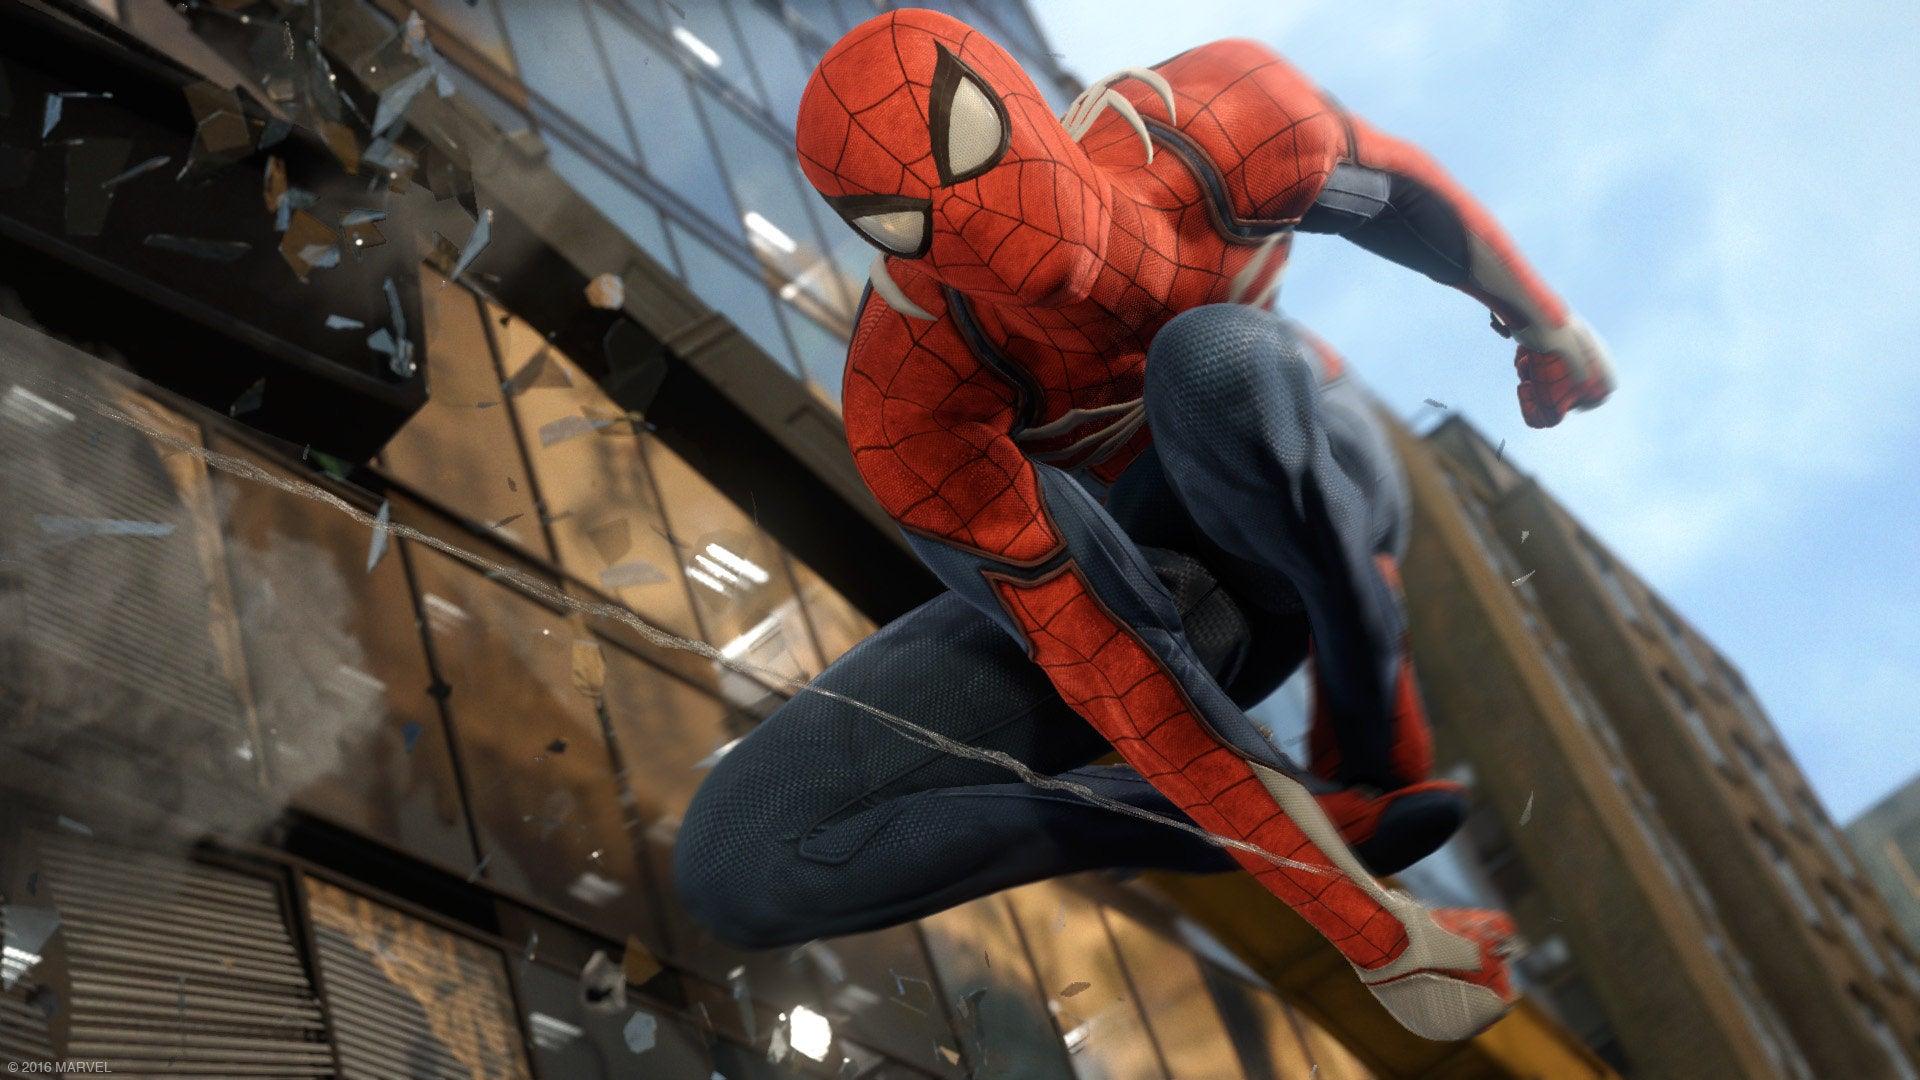 Marvel's Spider-ManUnderstands The Amazing Fantasy Of Becoming Peter Parker